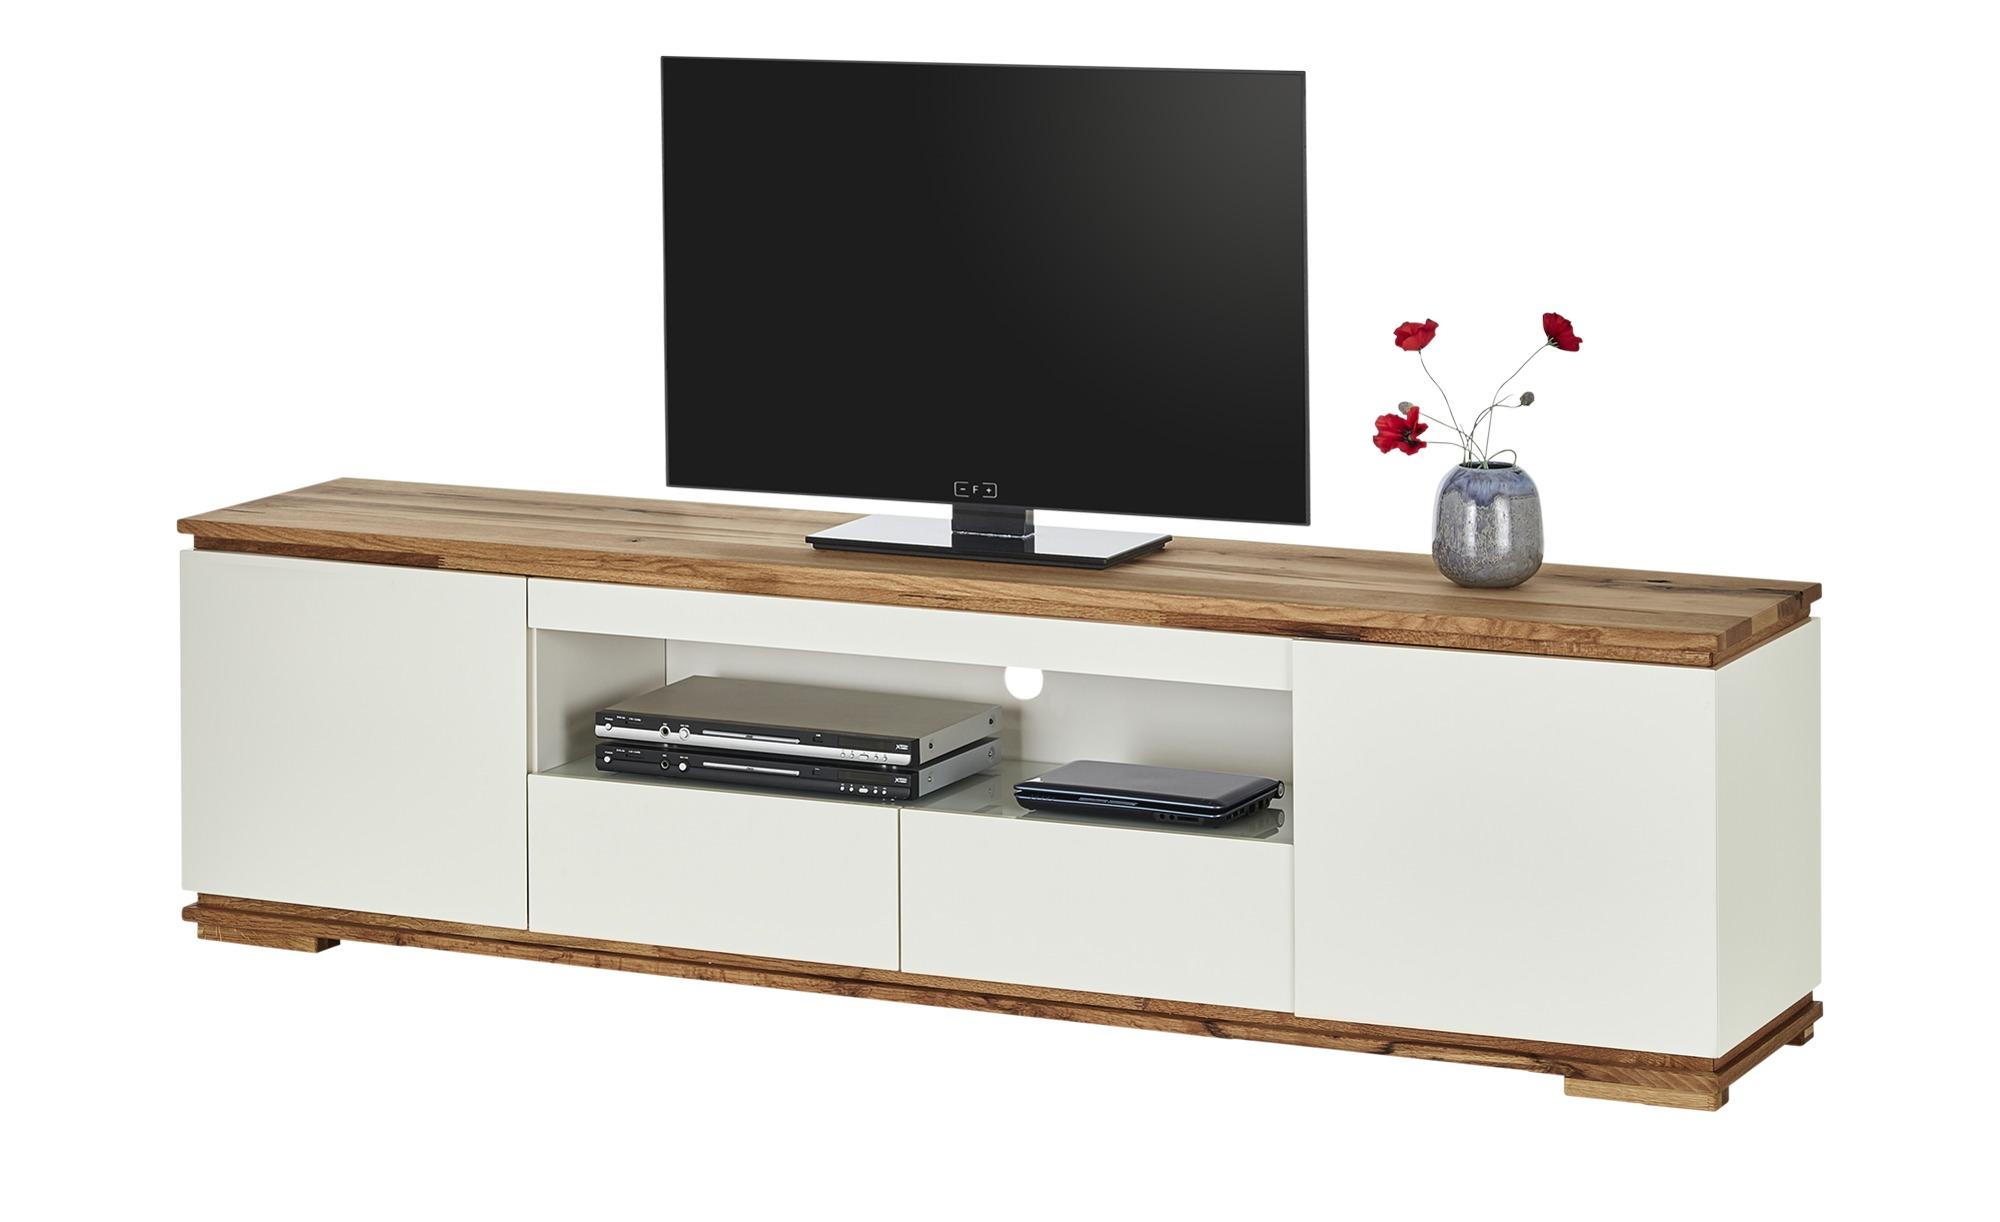 TV-Lowboard  Messina ¦ weiß ¦ Maße (cm): B: 202 H: 54 T: 40 TV- & Media Möbel > TV-Racks - Höffner